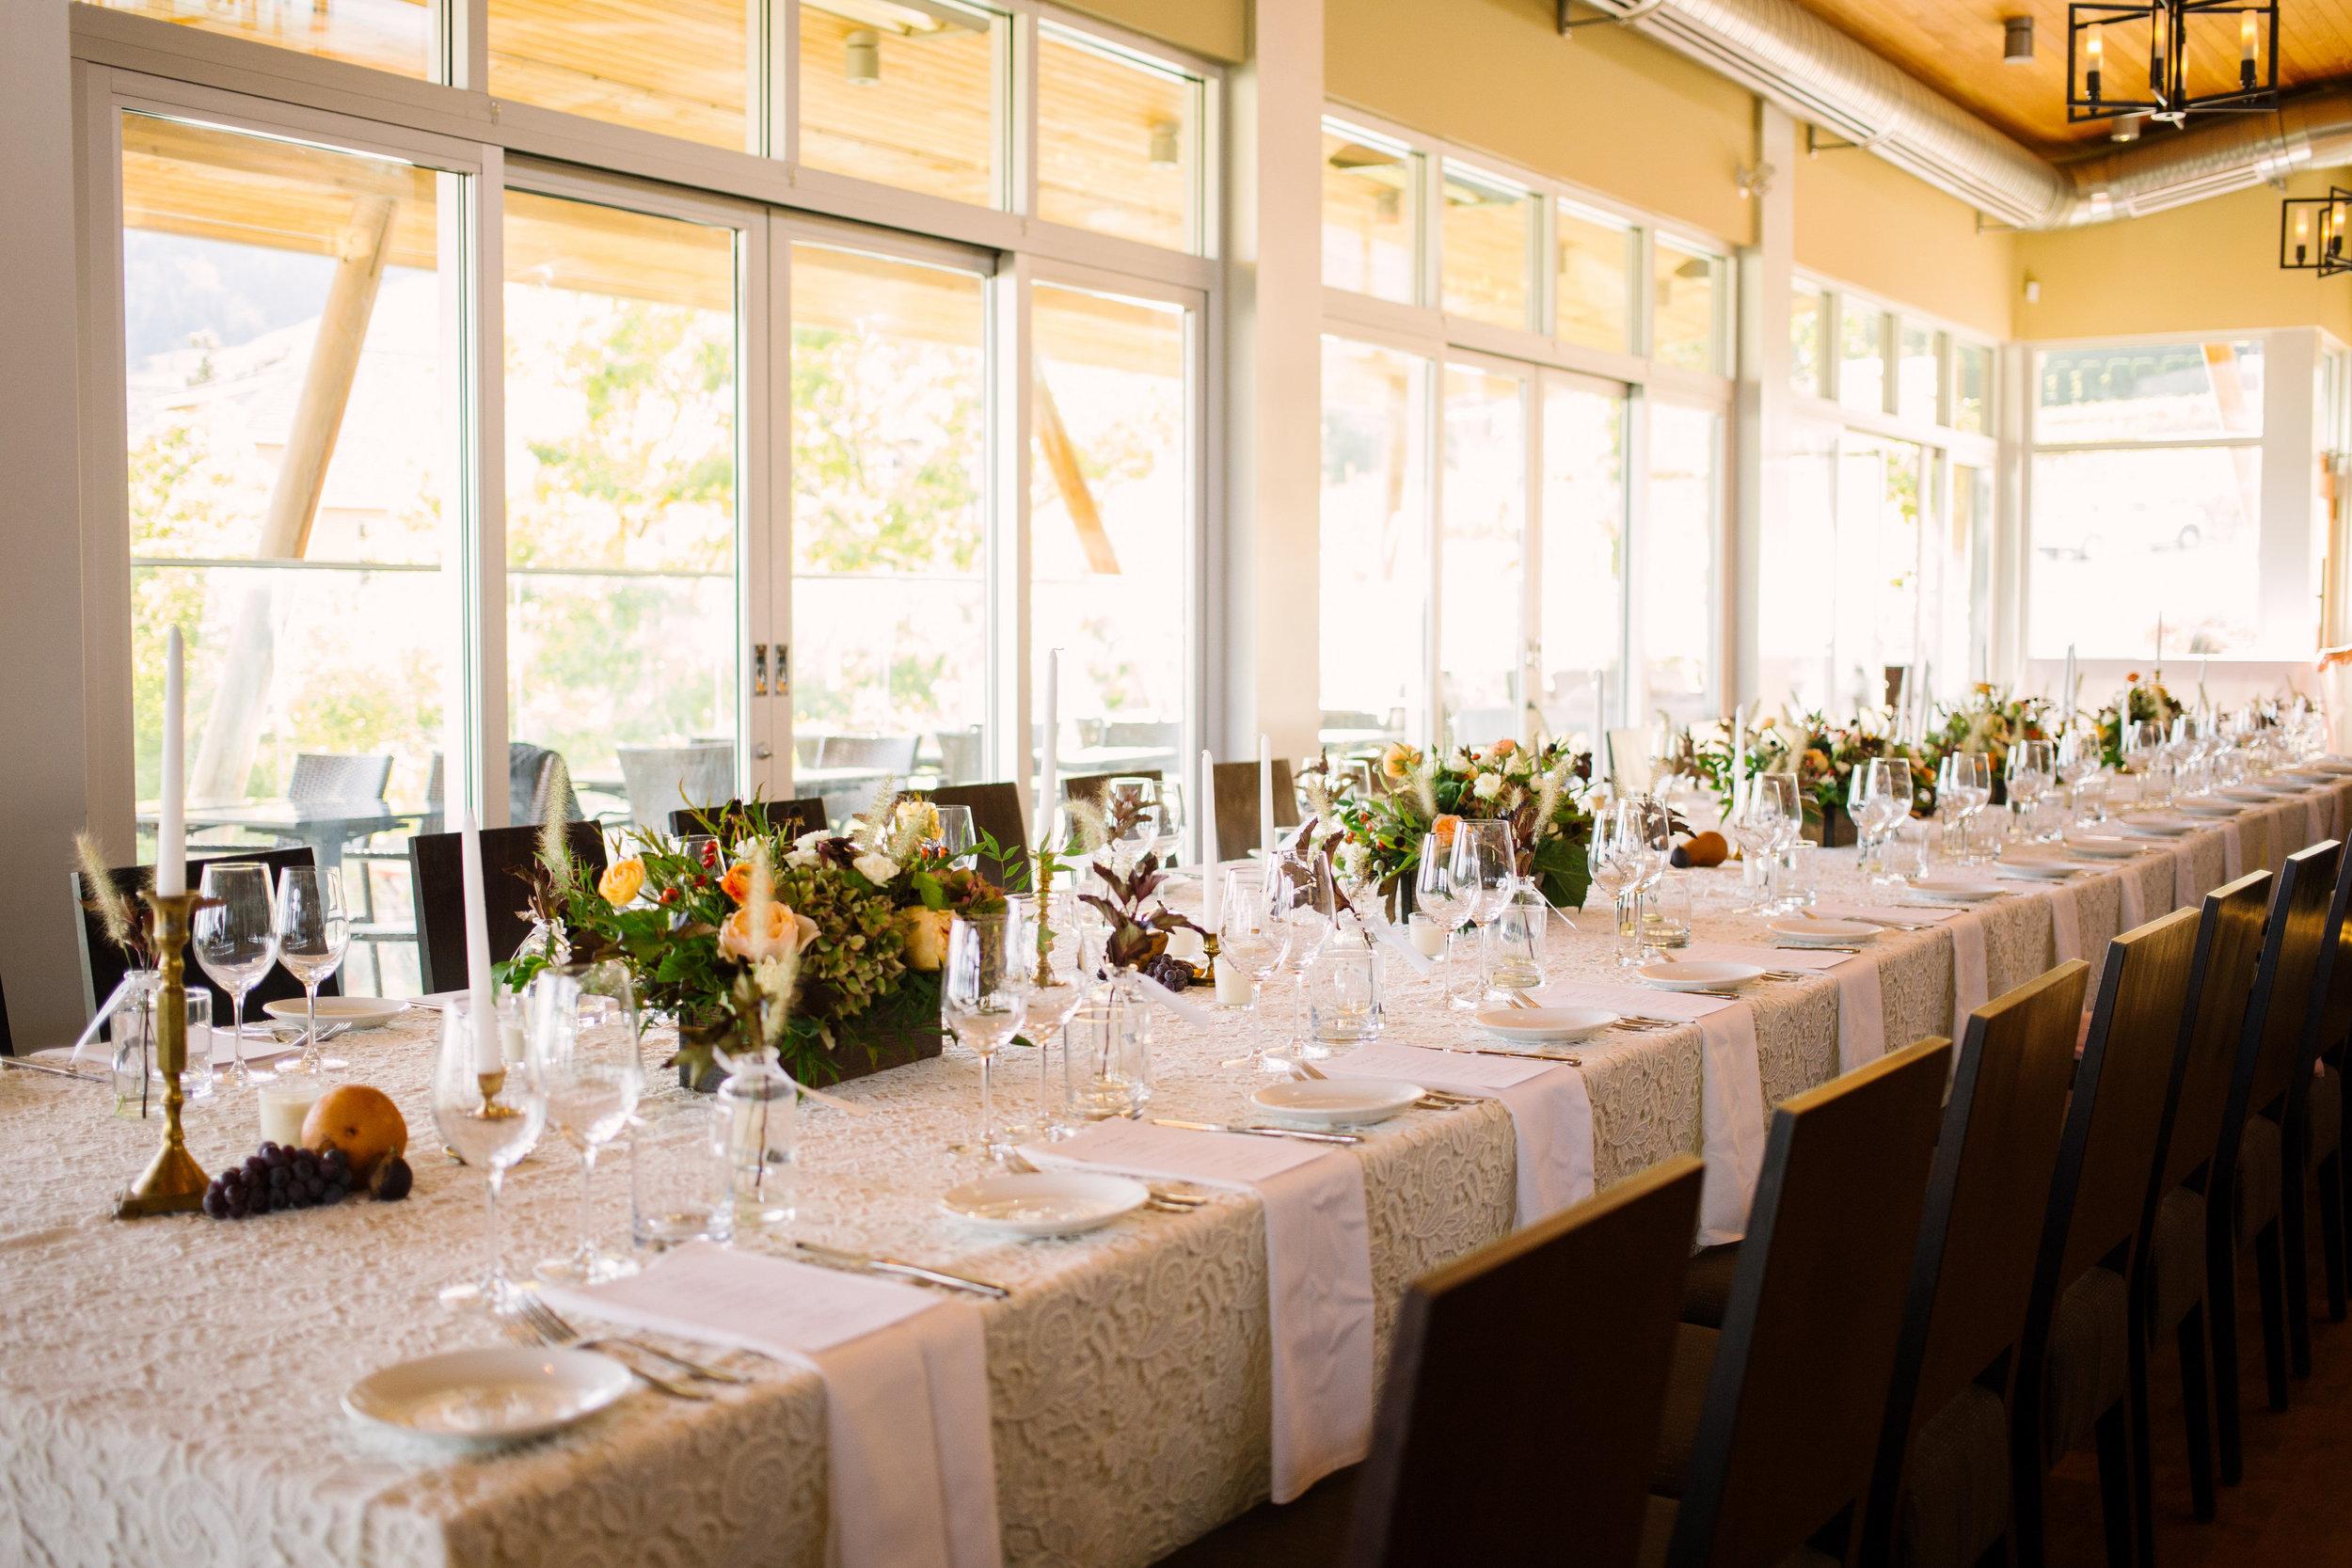 Kelowna Restaurant Wedding Reception .jpg